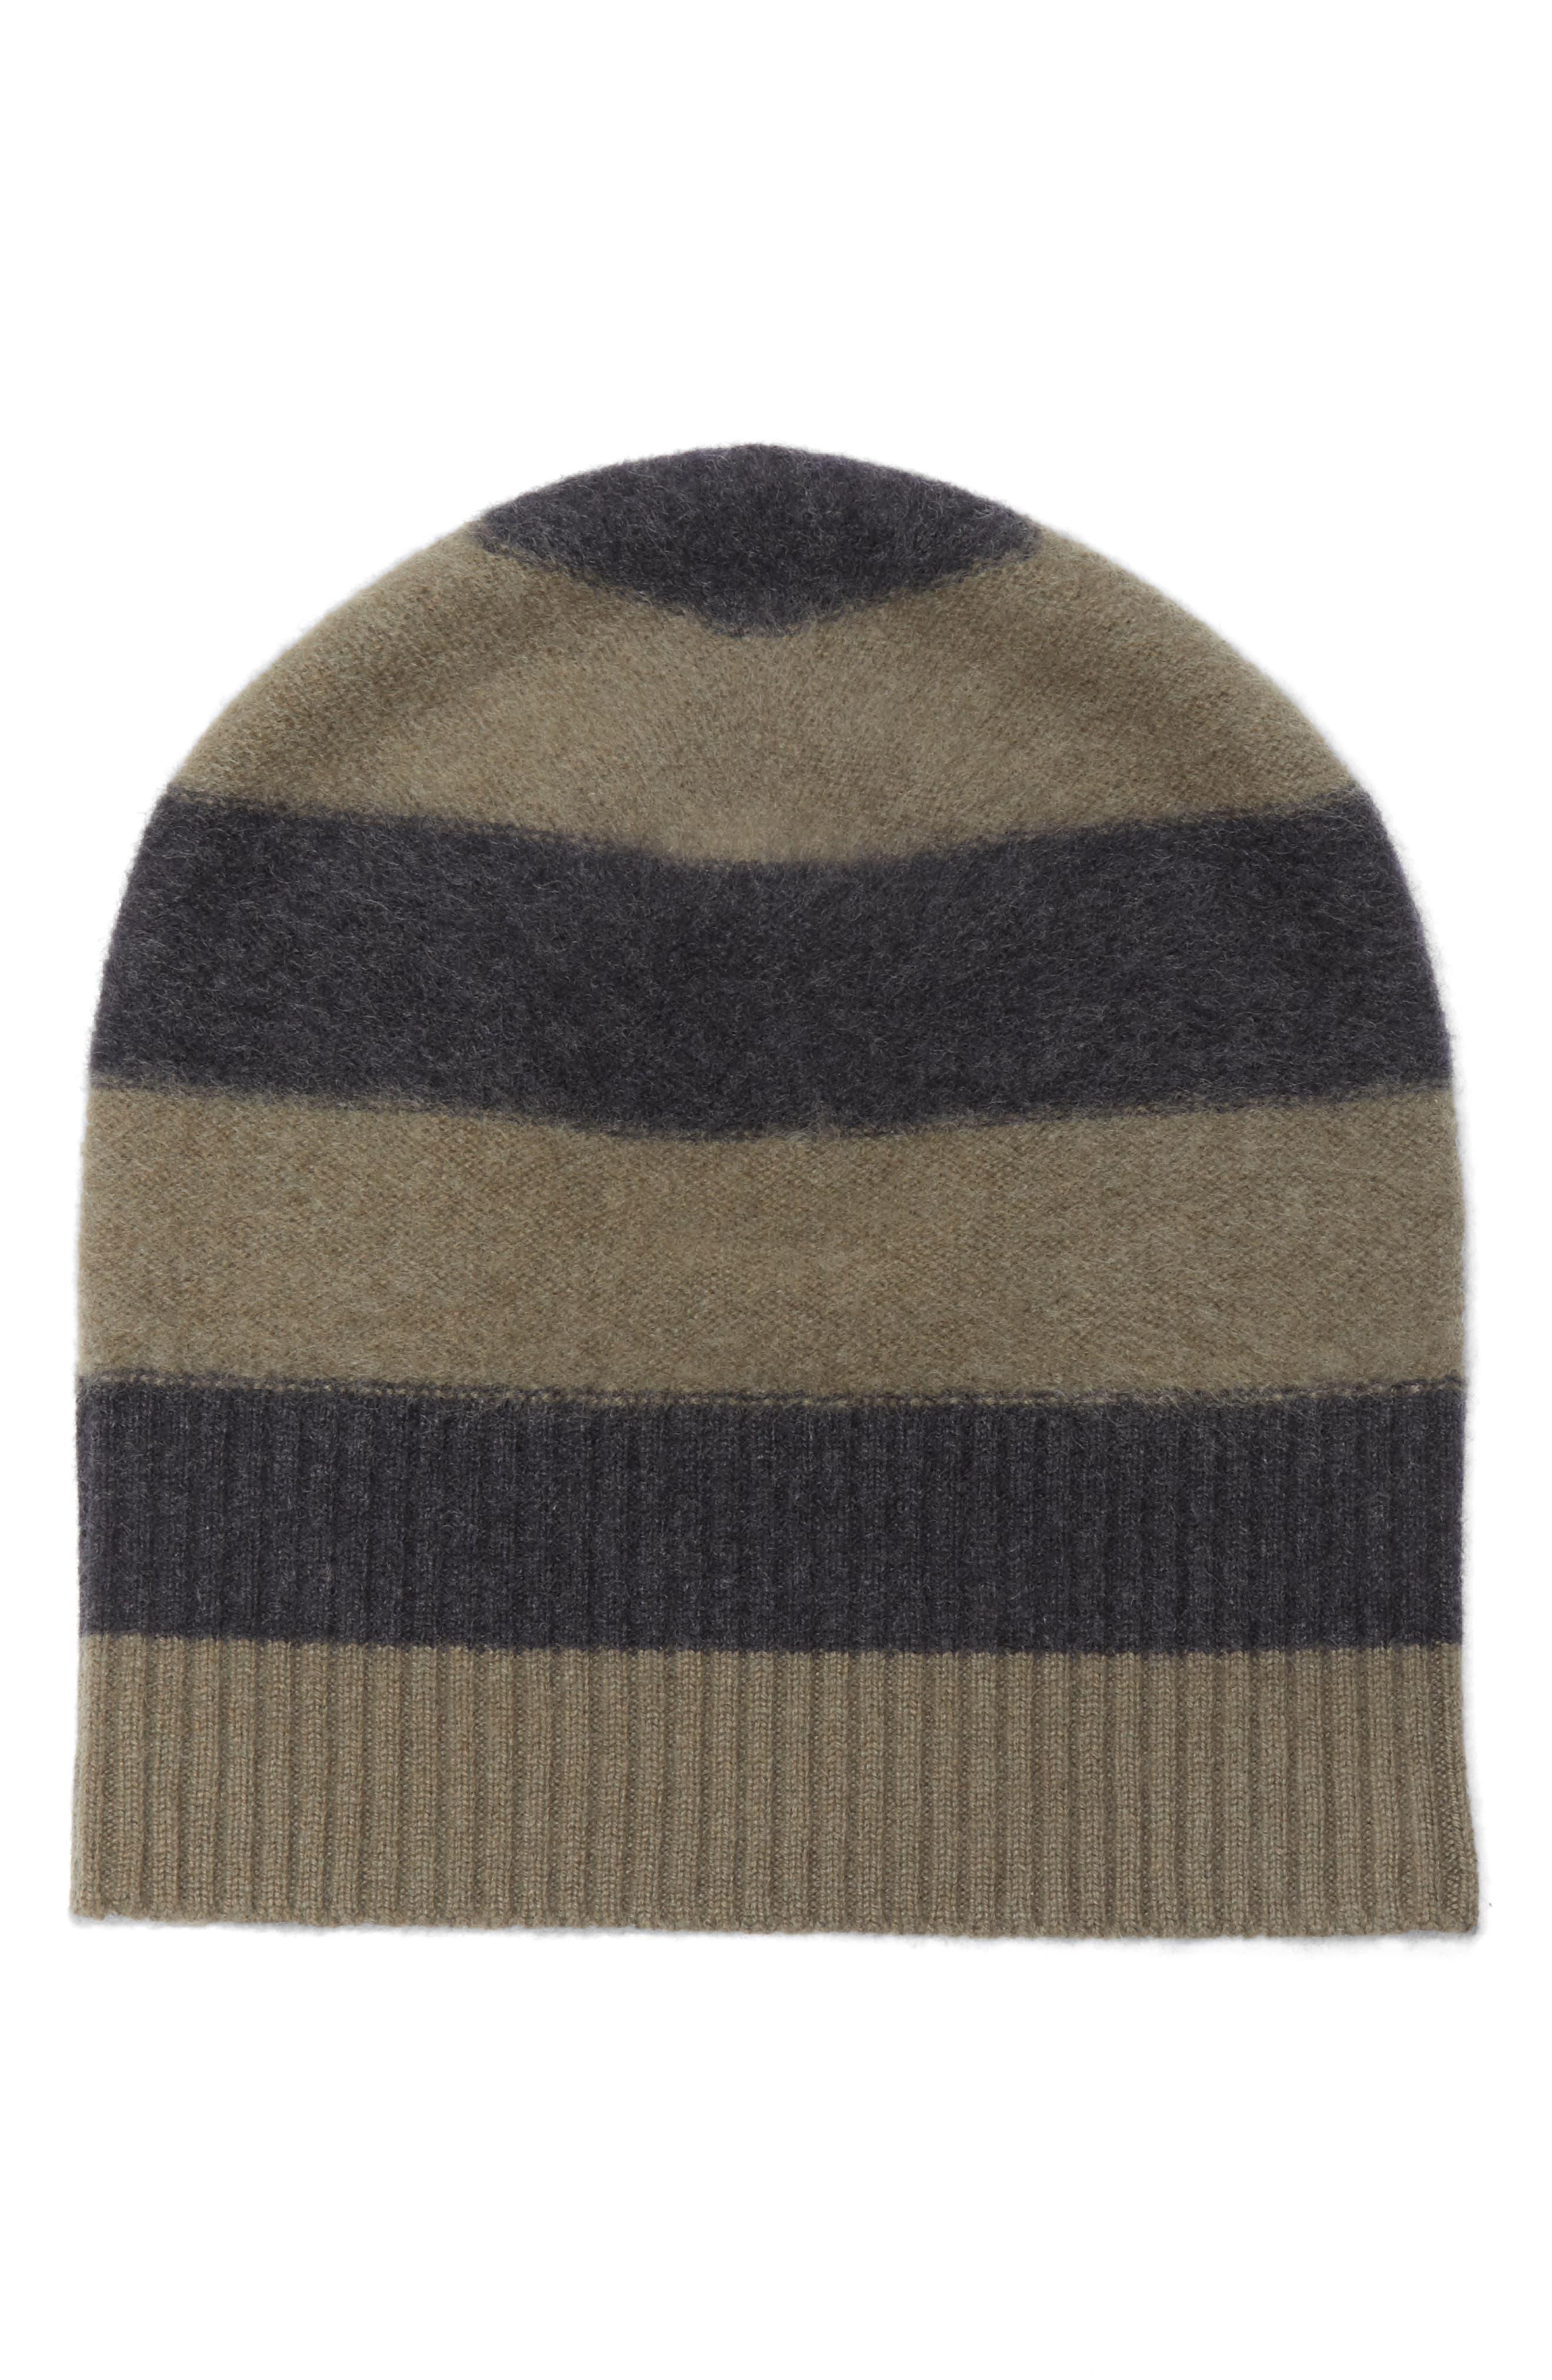 Stripe Cashmere Beanie,                         Main,                         color, 357